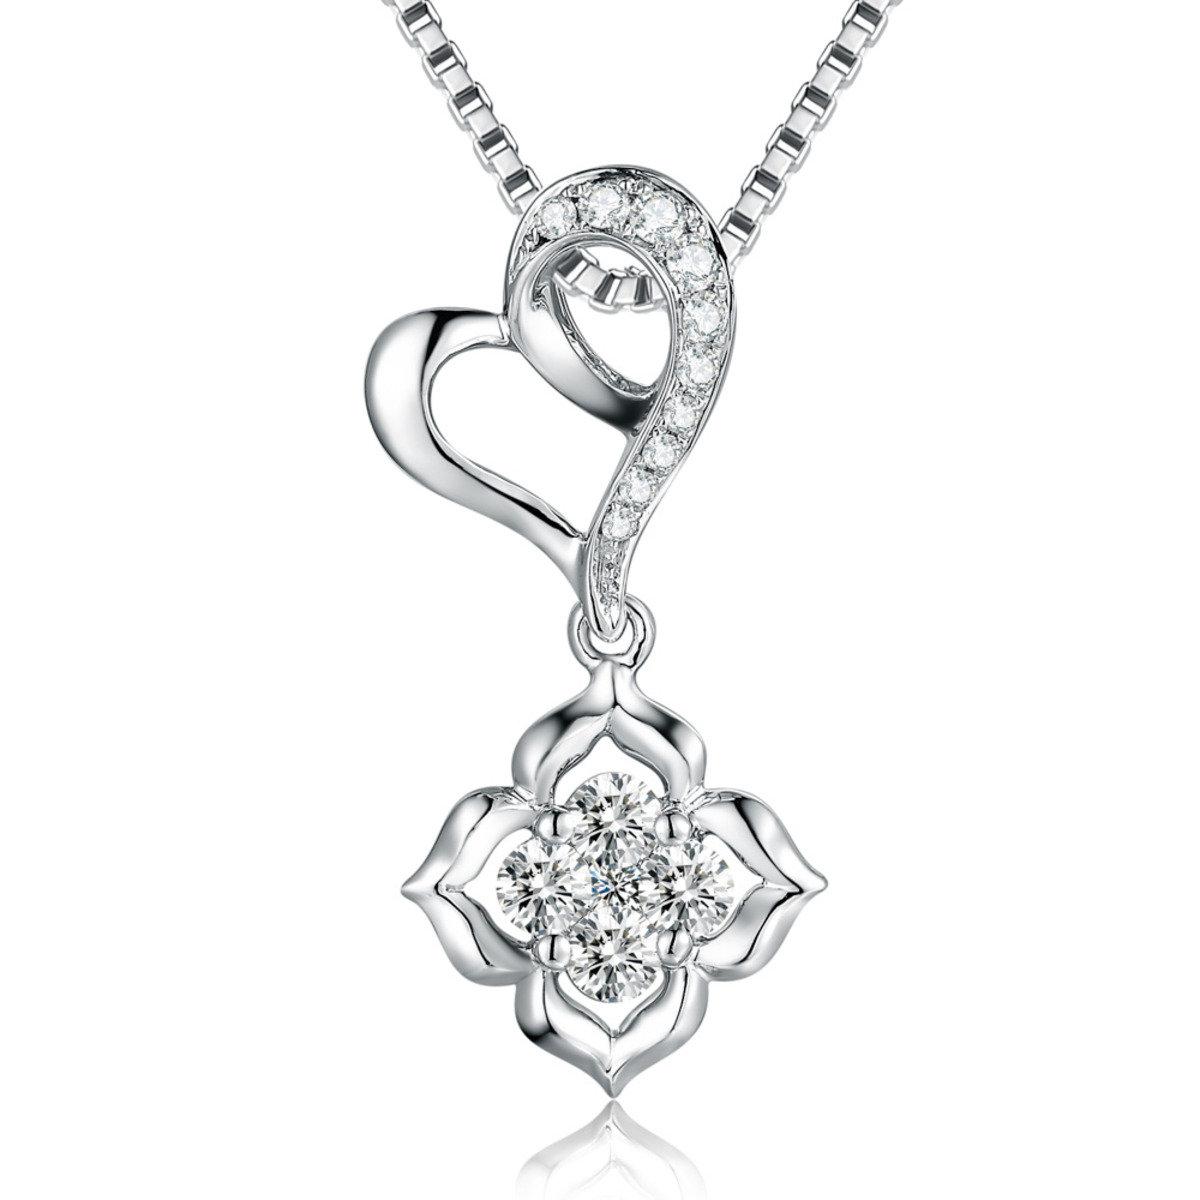 18K/750 白色黃金鑽石鑲嵌心心花兒吊墜 (此吊墜不包括項鍊)